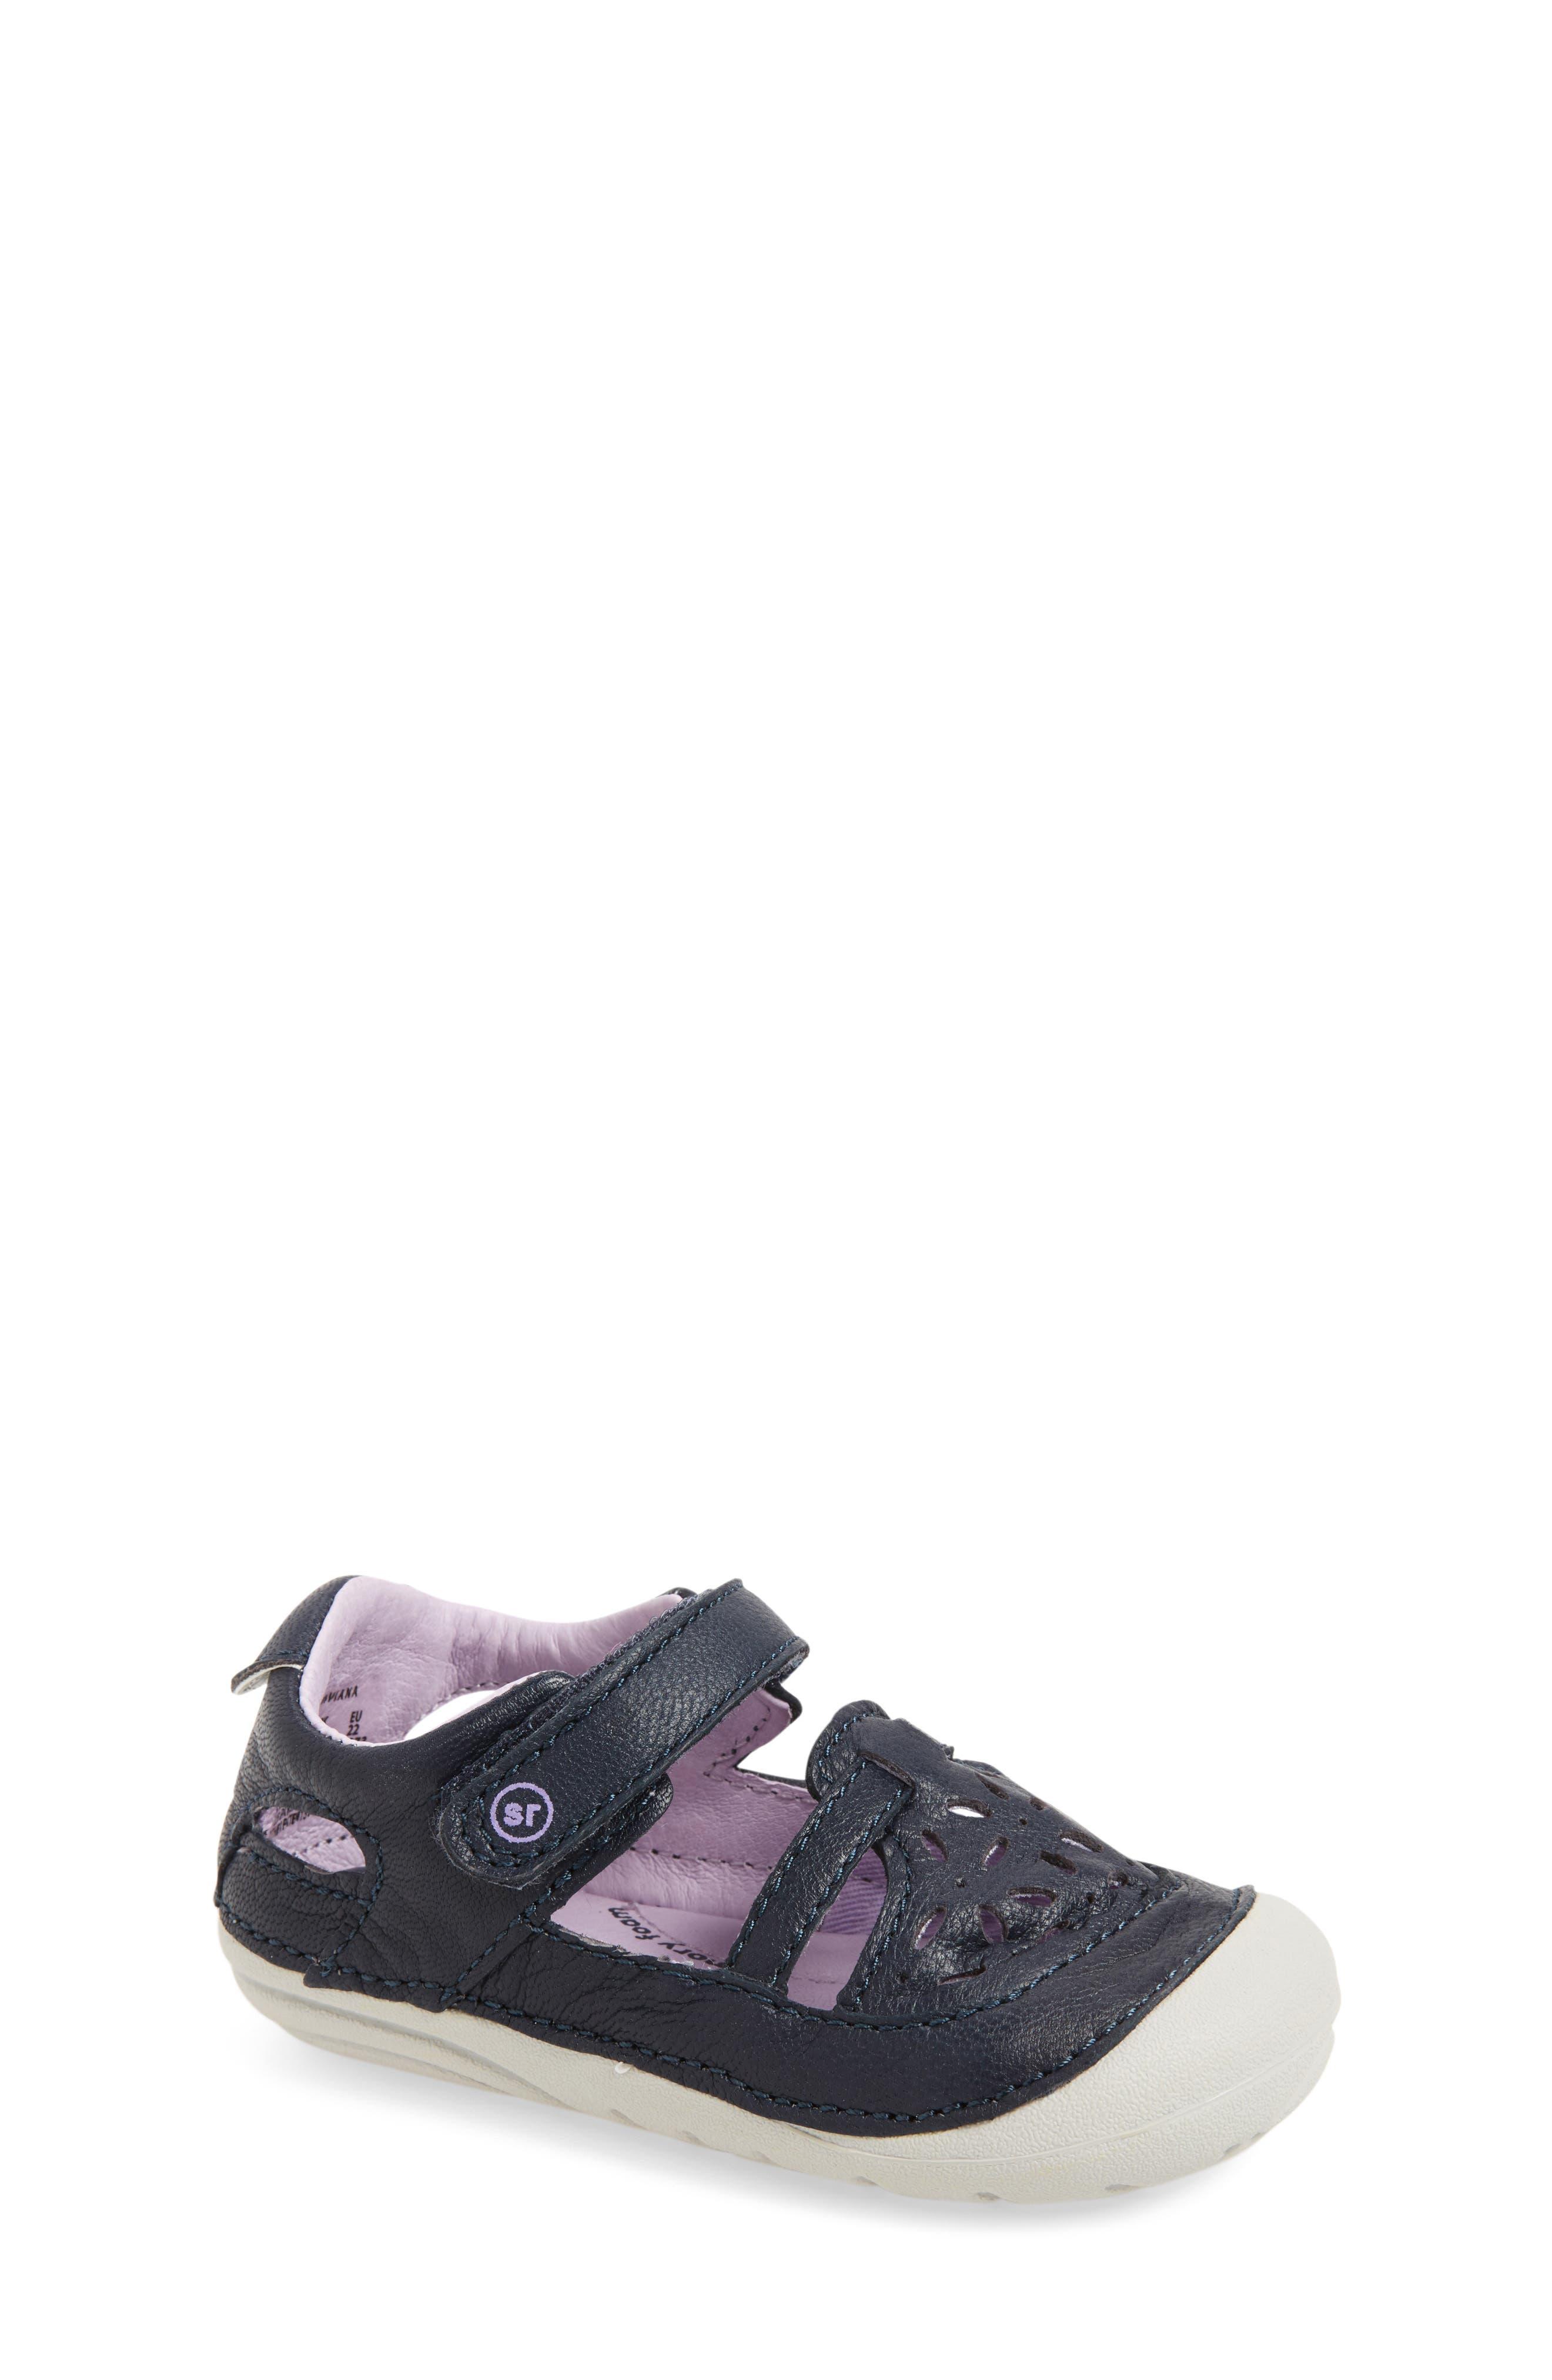 Alternate Image 1 Selected - Stride Rite Viviana Soft Motion Sandal (Baby & Walker)